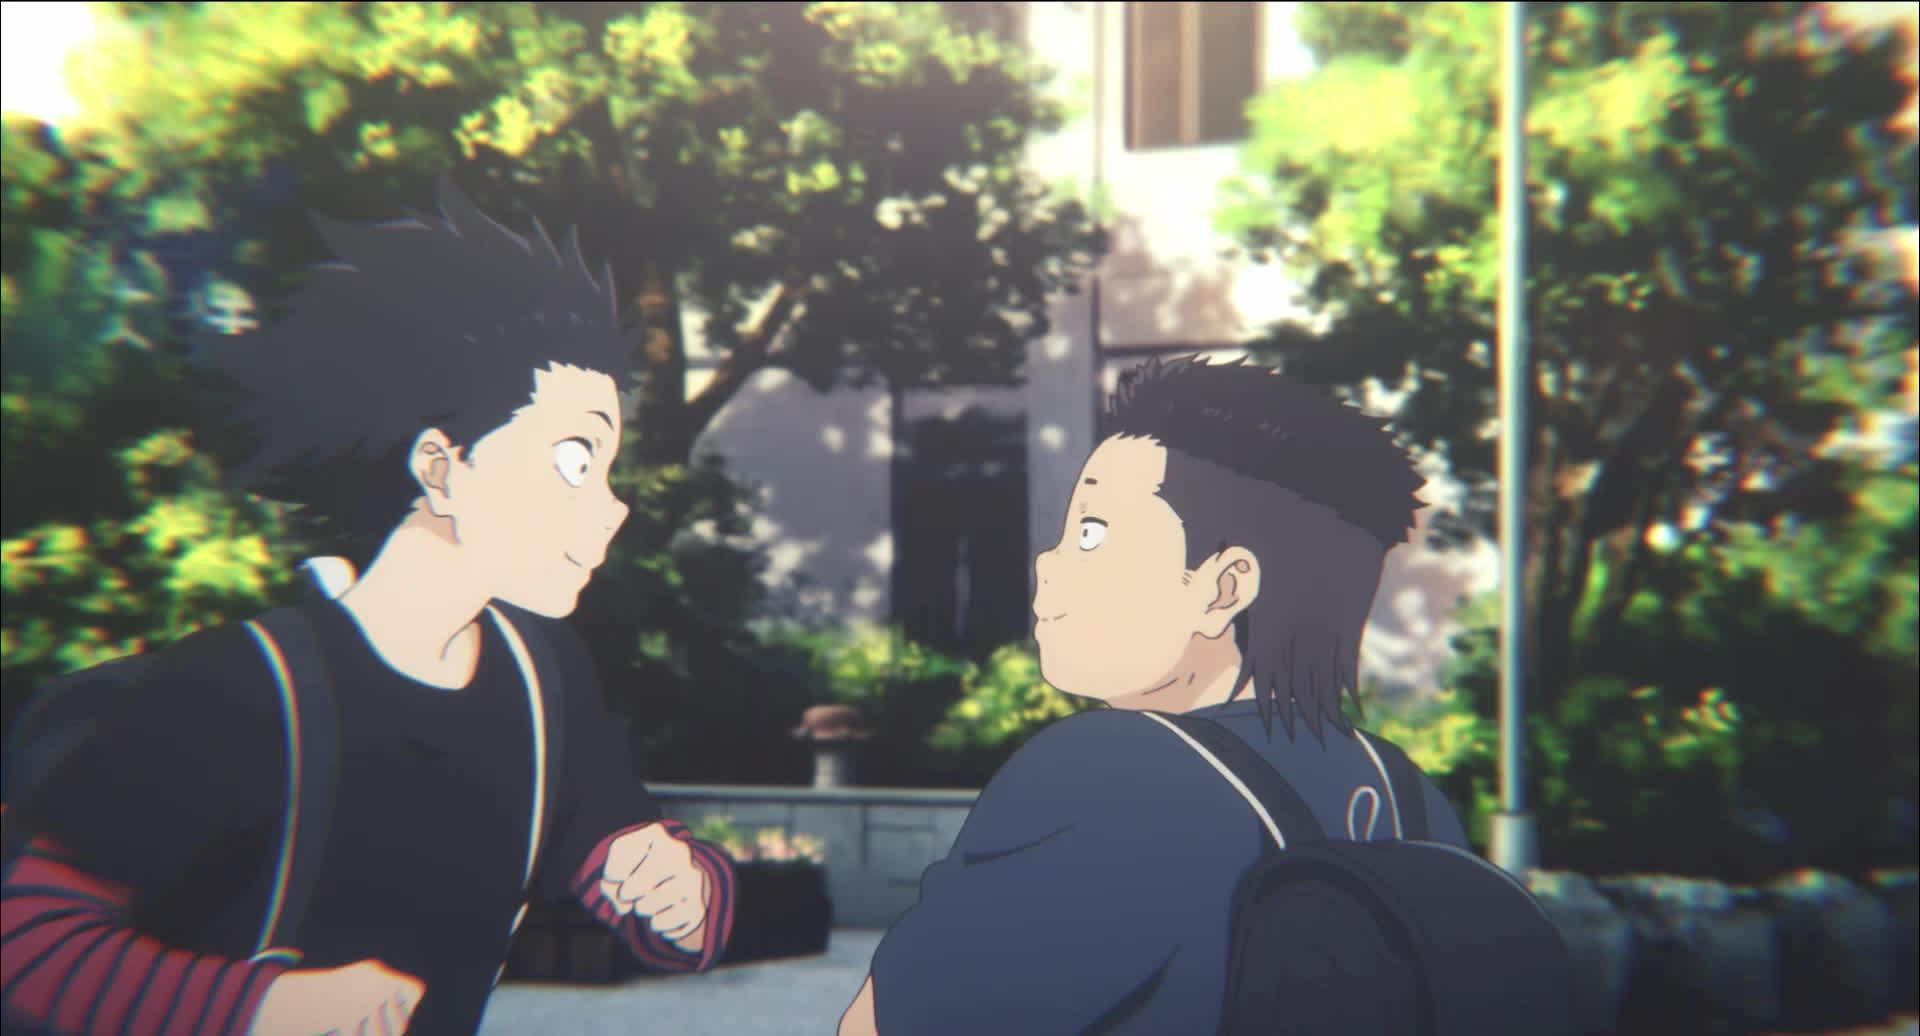 Handshakers GIFs